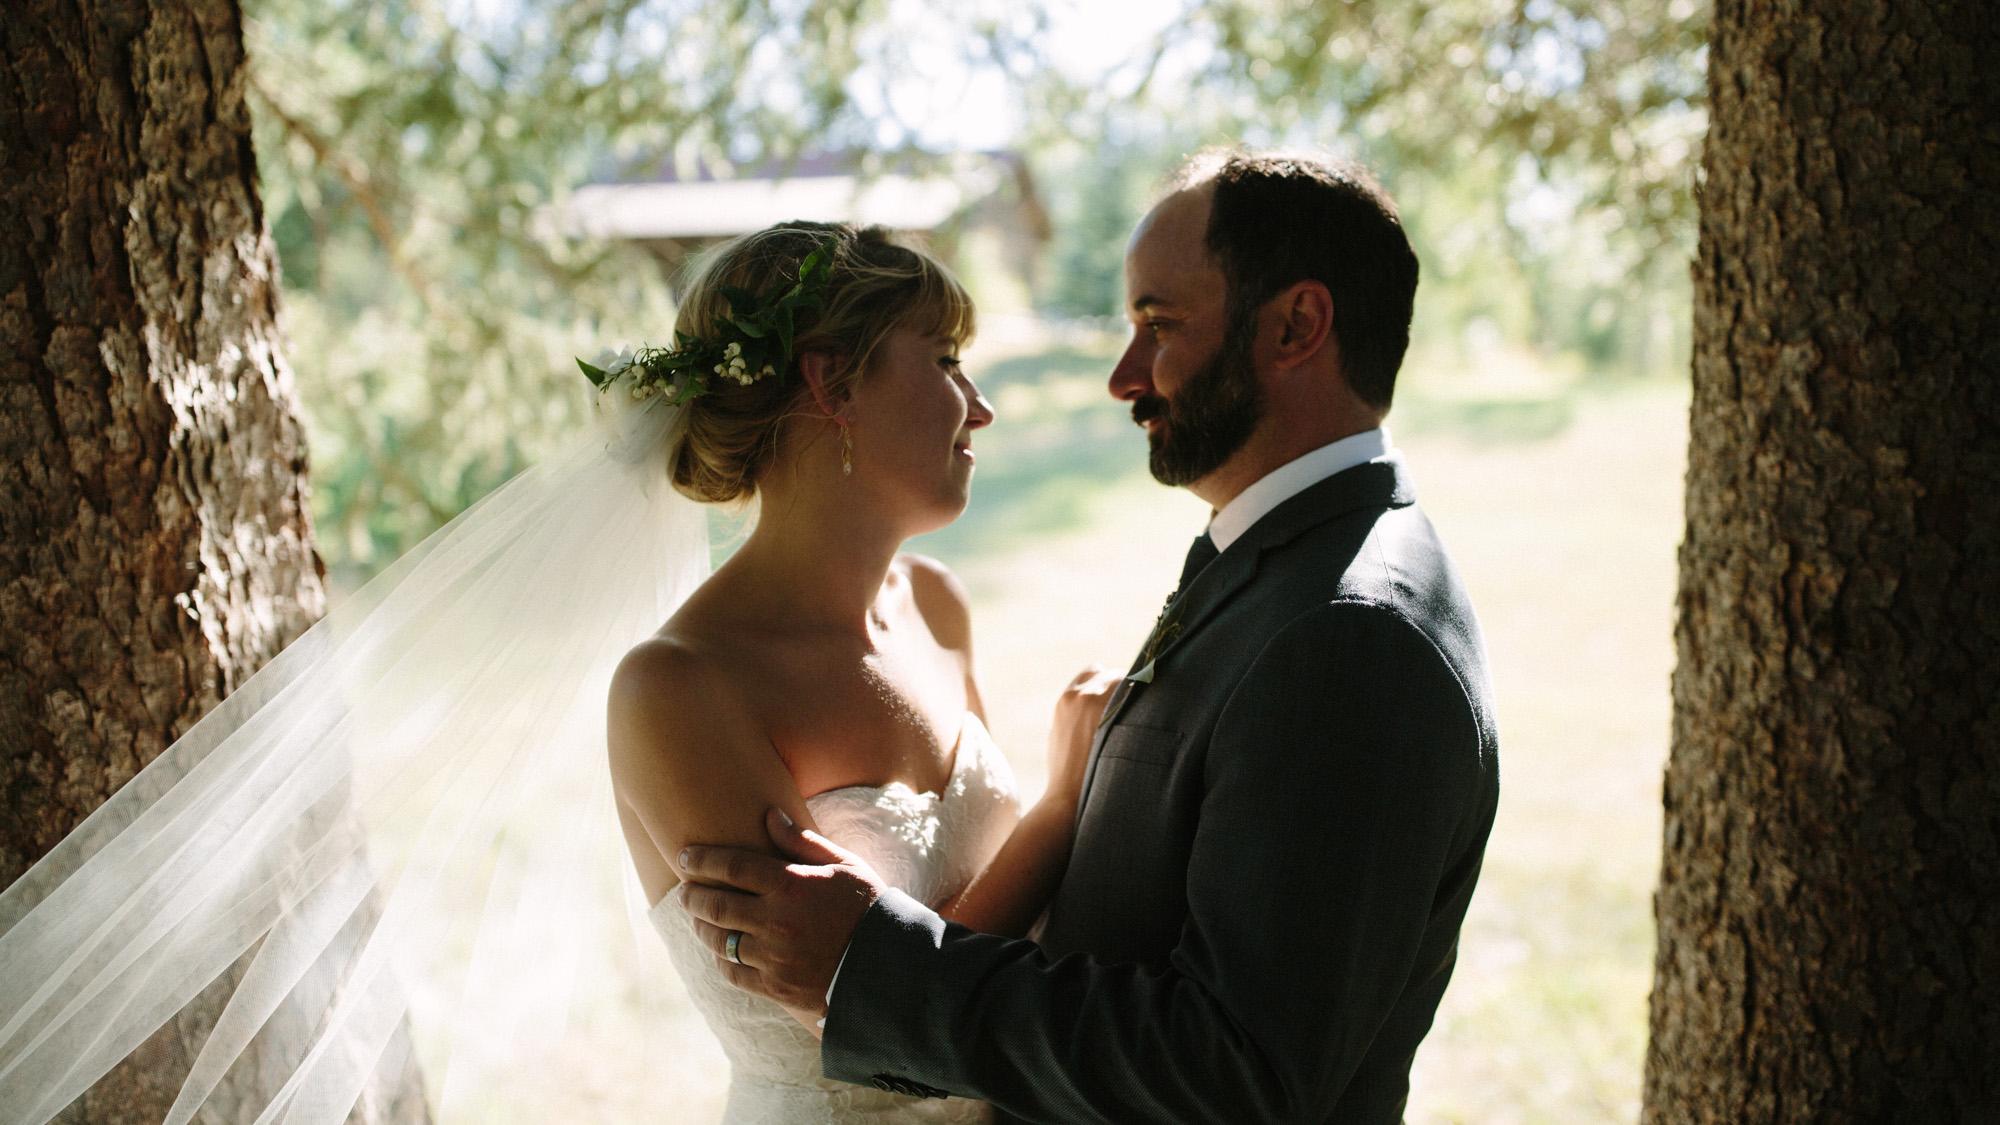 Montana_Wedding_Photos_alec_vanderboom-0110.jpg